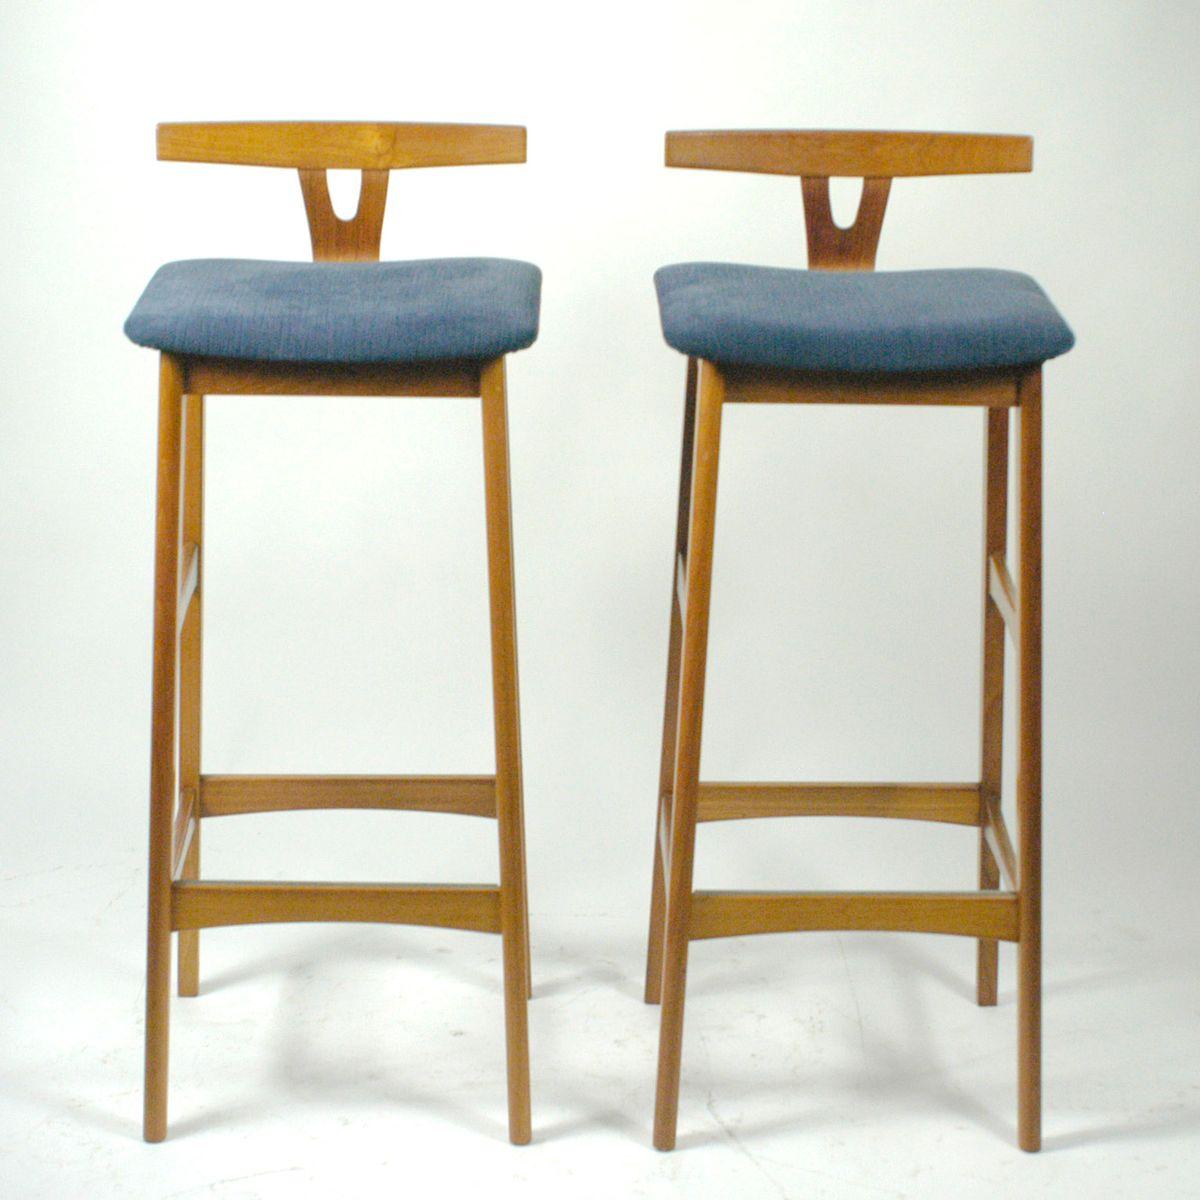 tabouret de bar en teck par knud bent pour dyrlund danemark 1960s en vente sur pamono. Black Bedroom Furniture Sets. Home Design Ideas